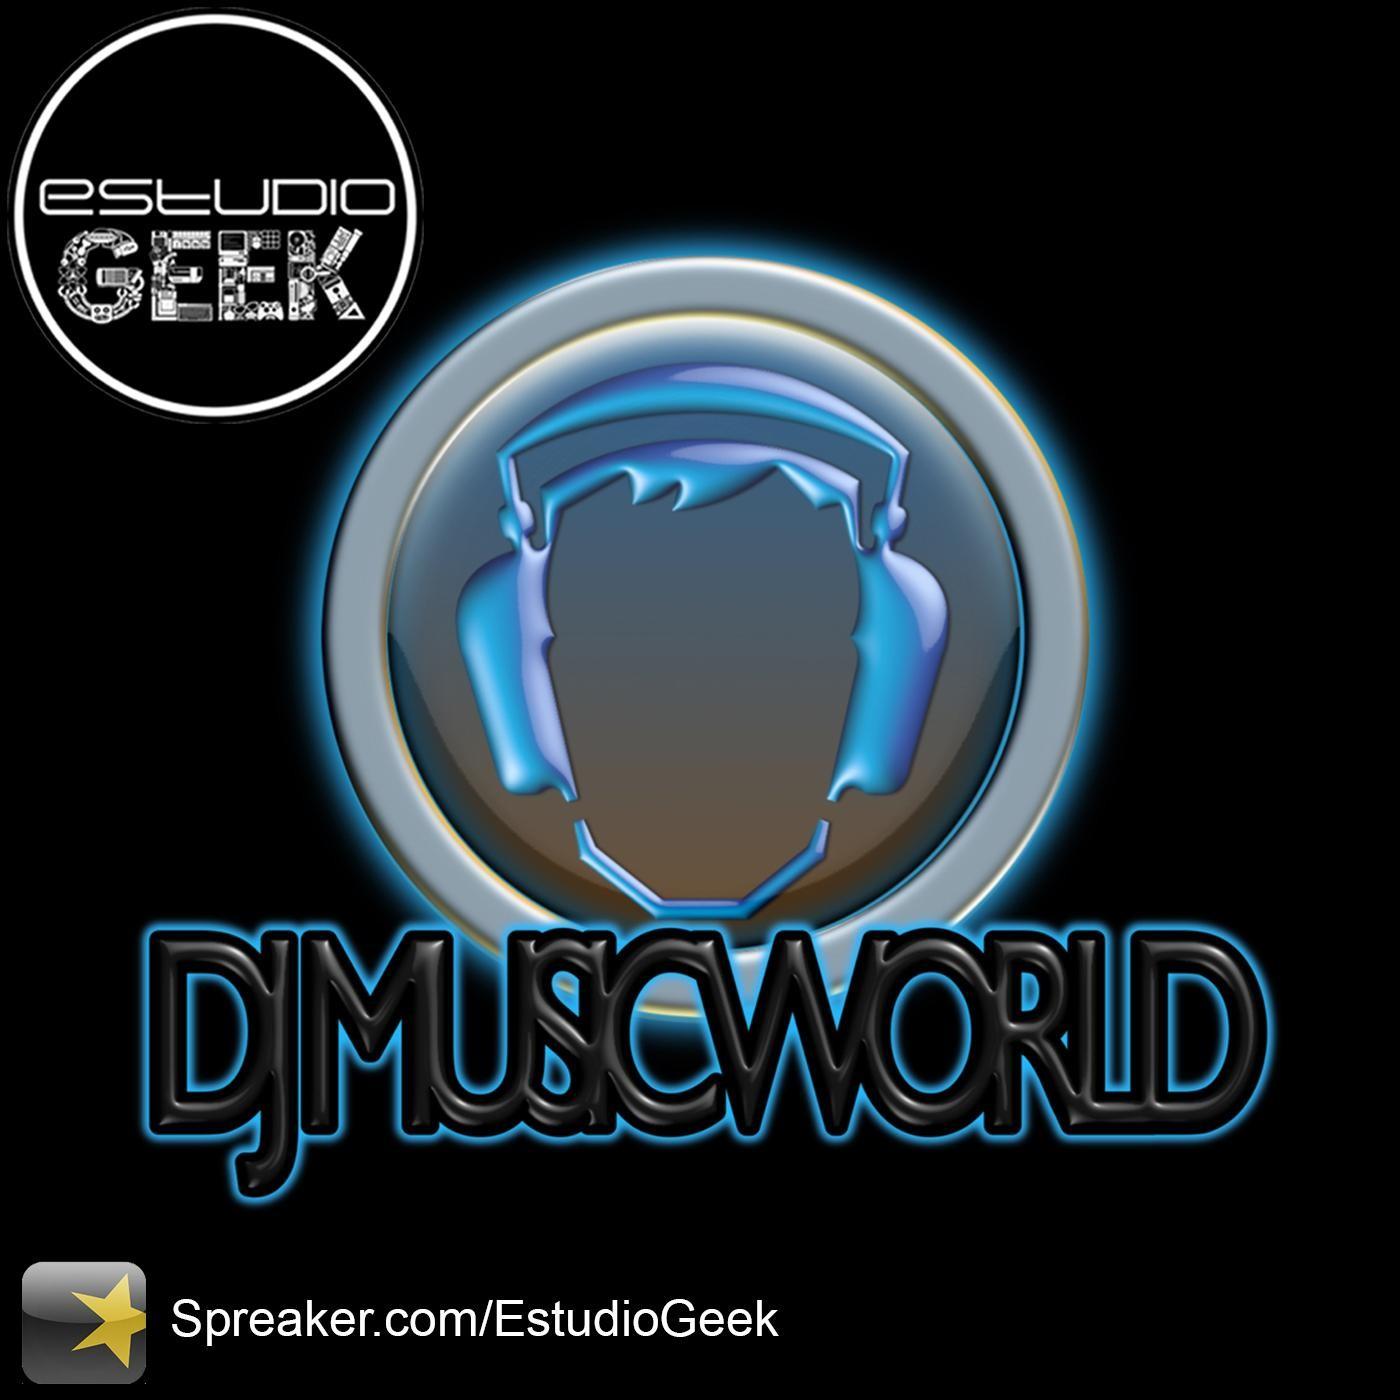 DJ Music World